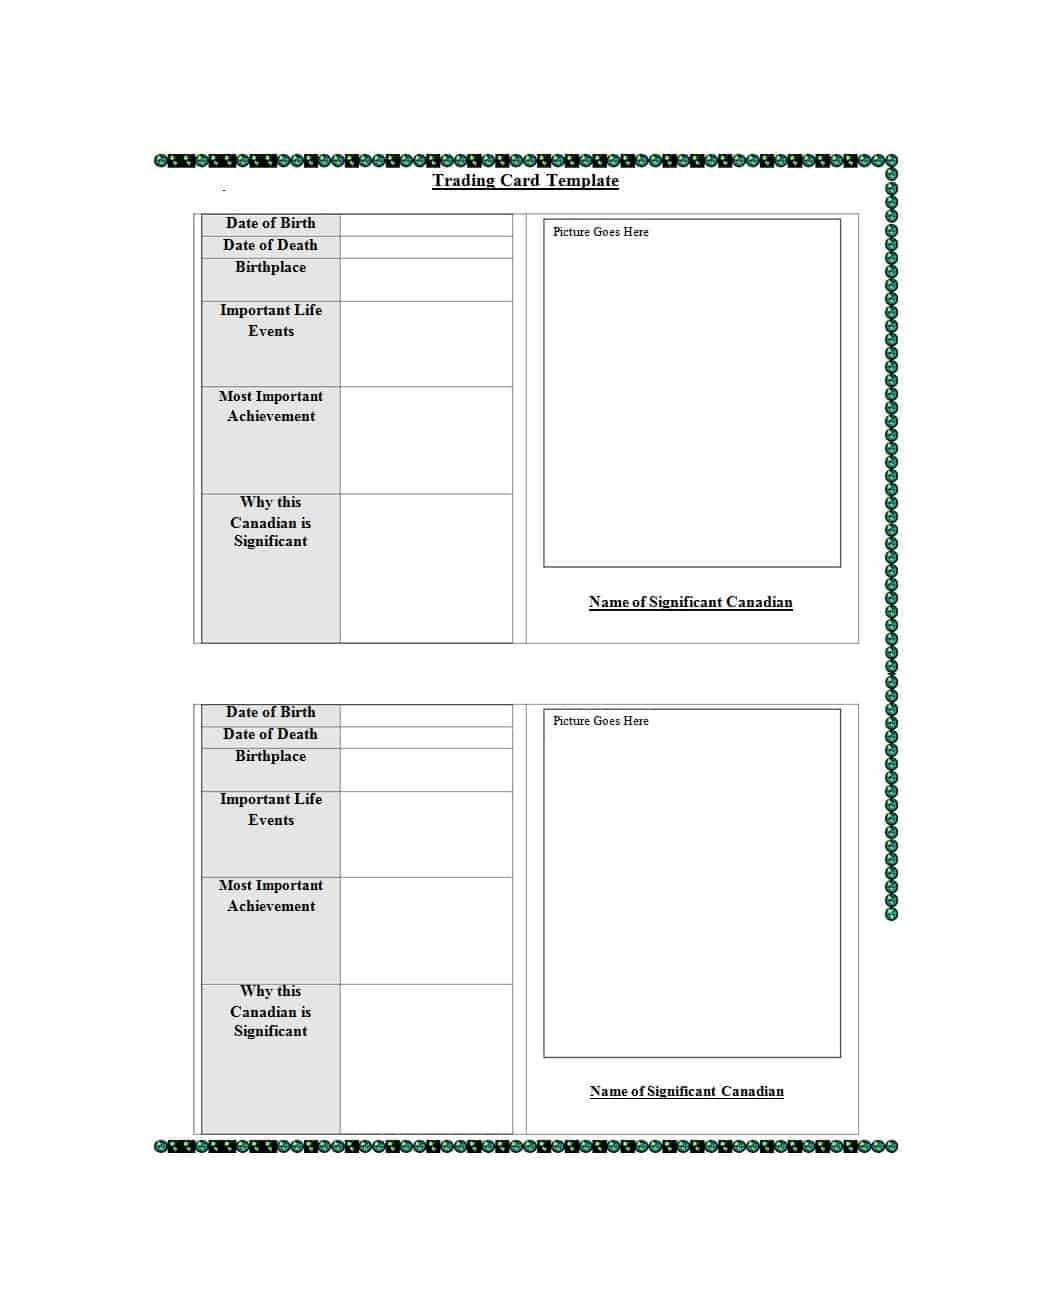 33 Free Trading Card Templates (Baseball, Football, Etc Regarding Trading Cards Templates Free Download